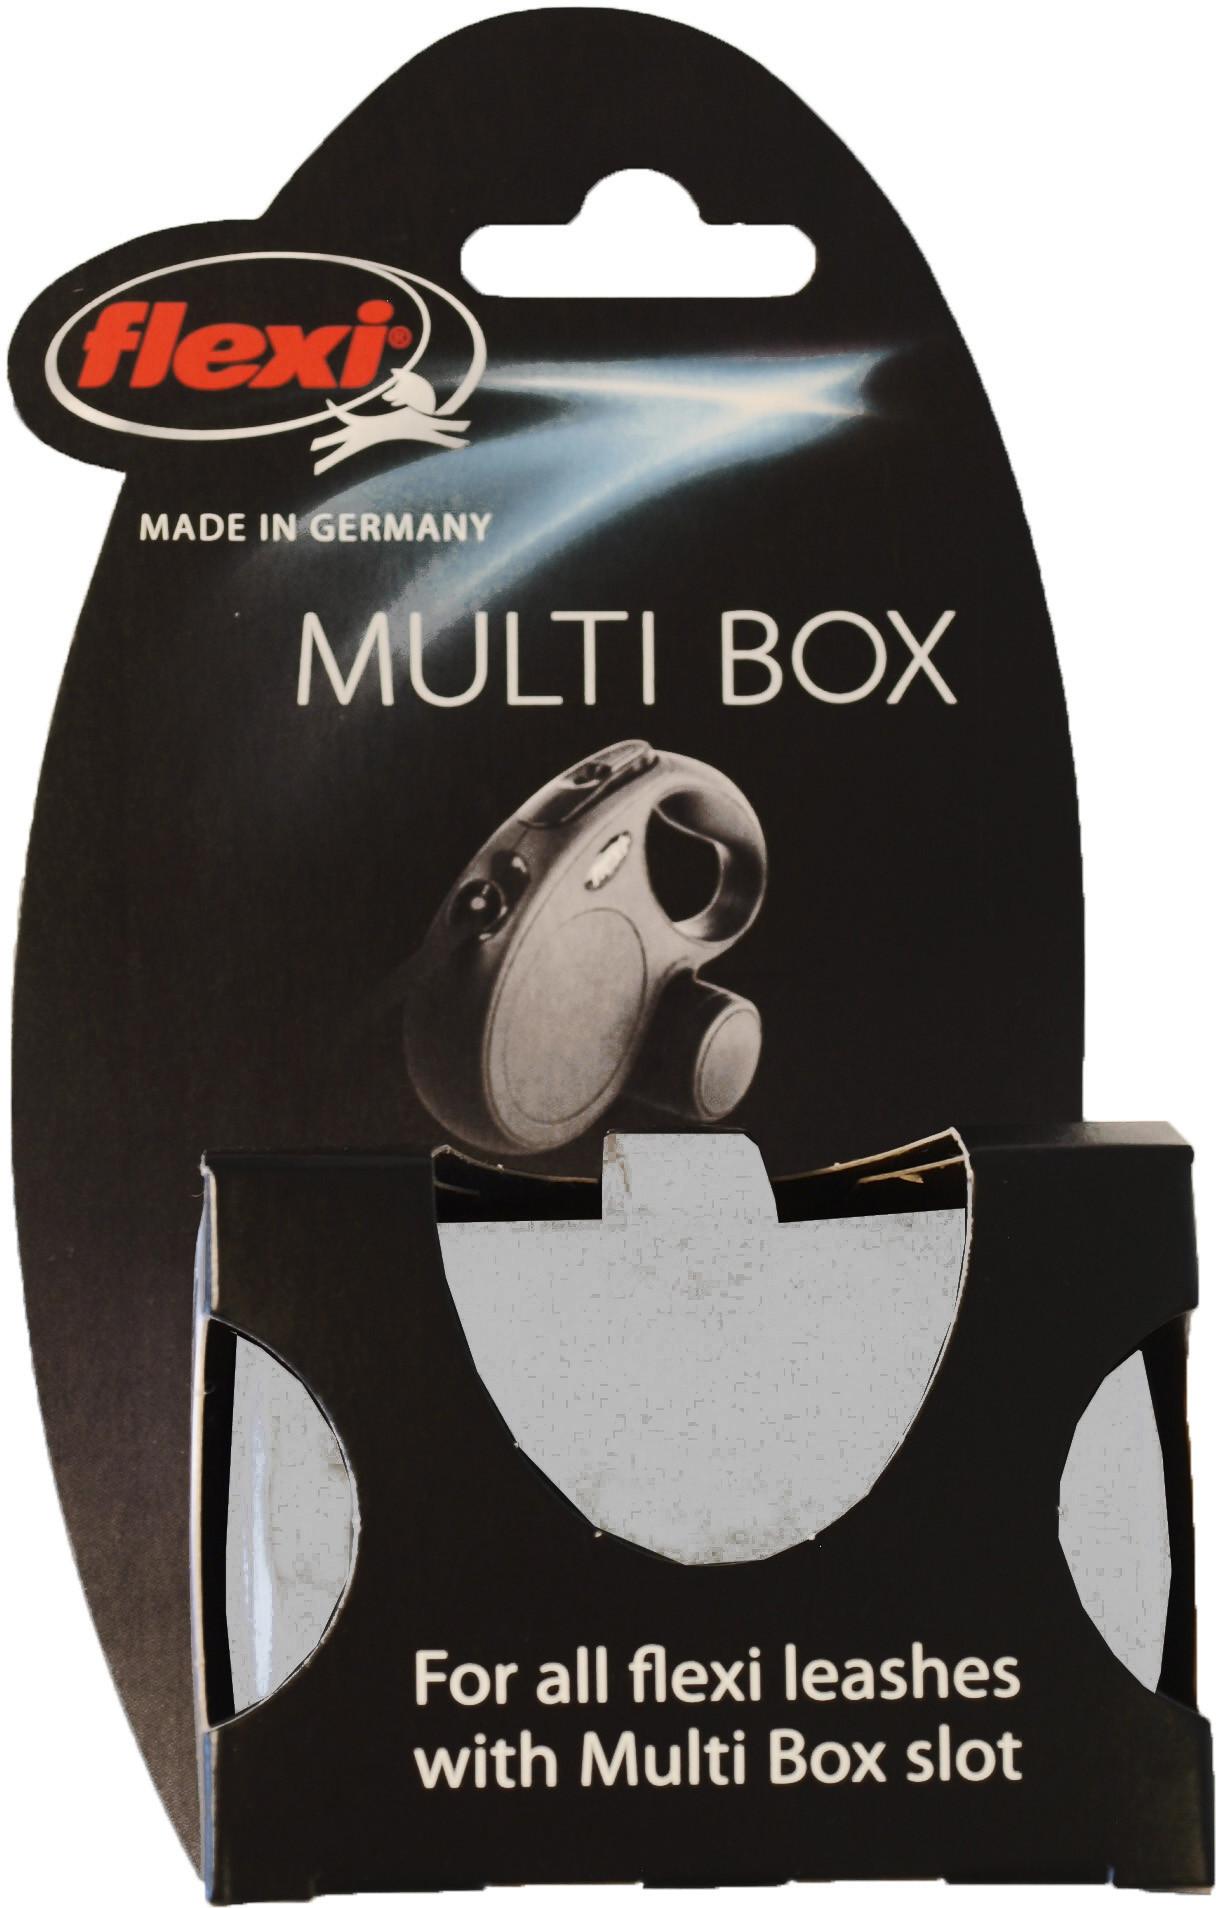 Flexi Multibox